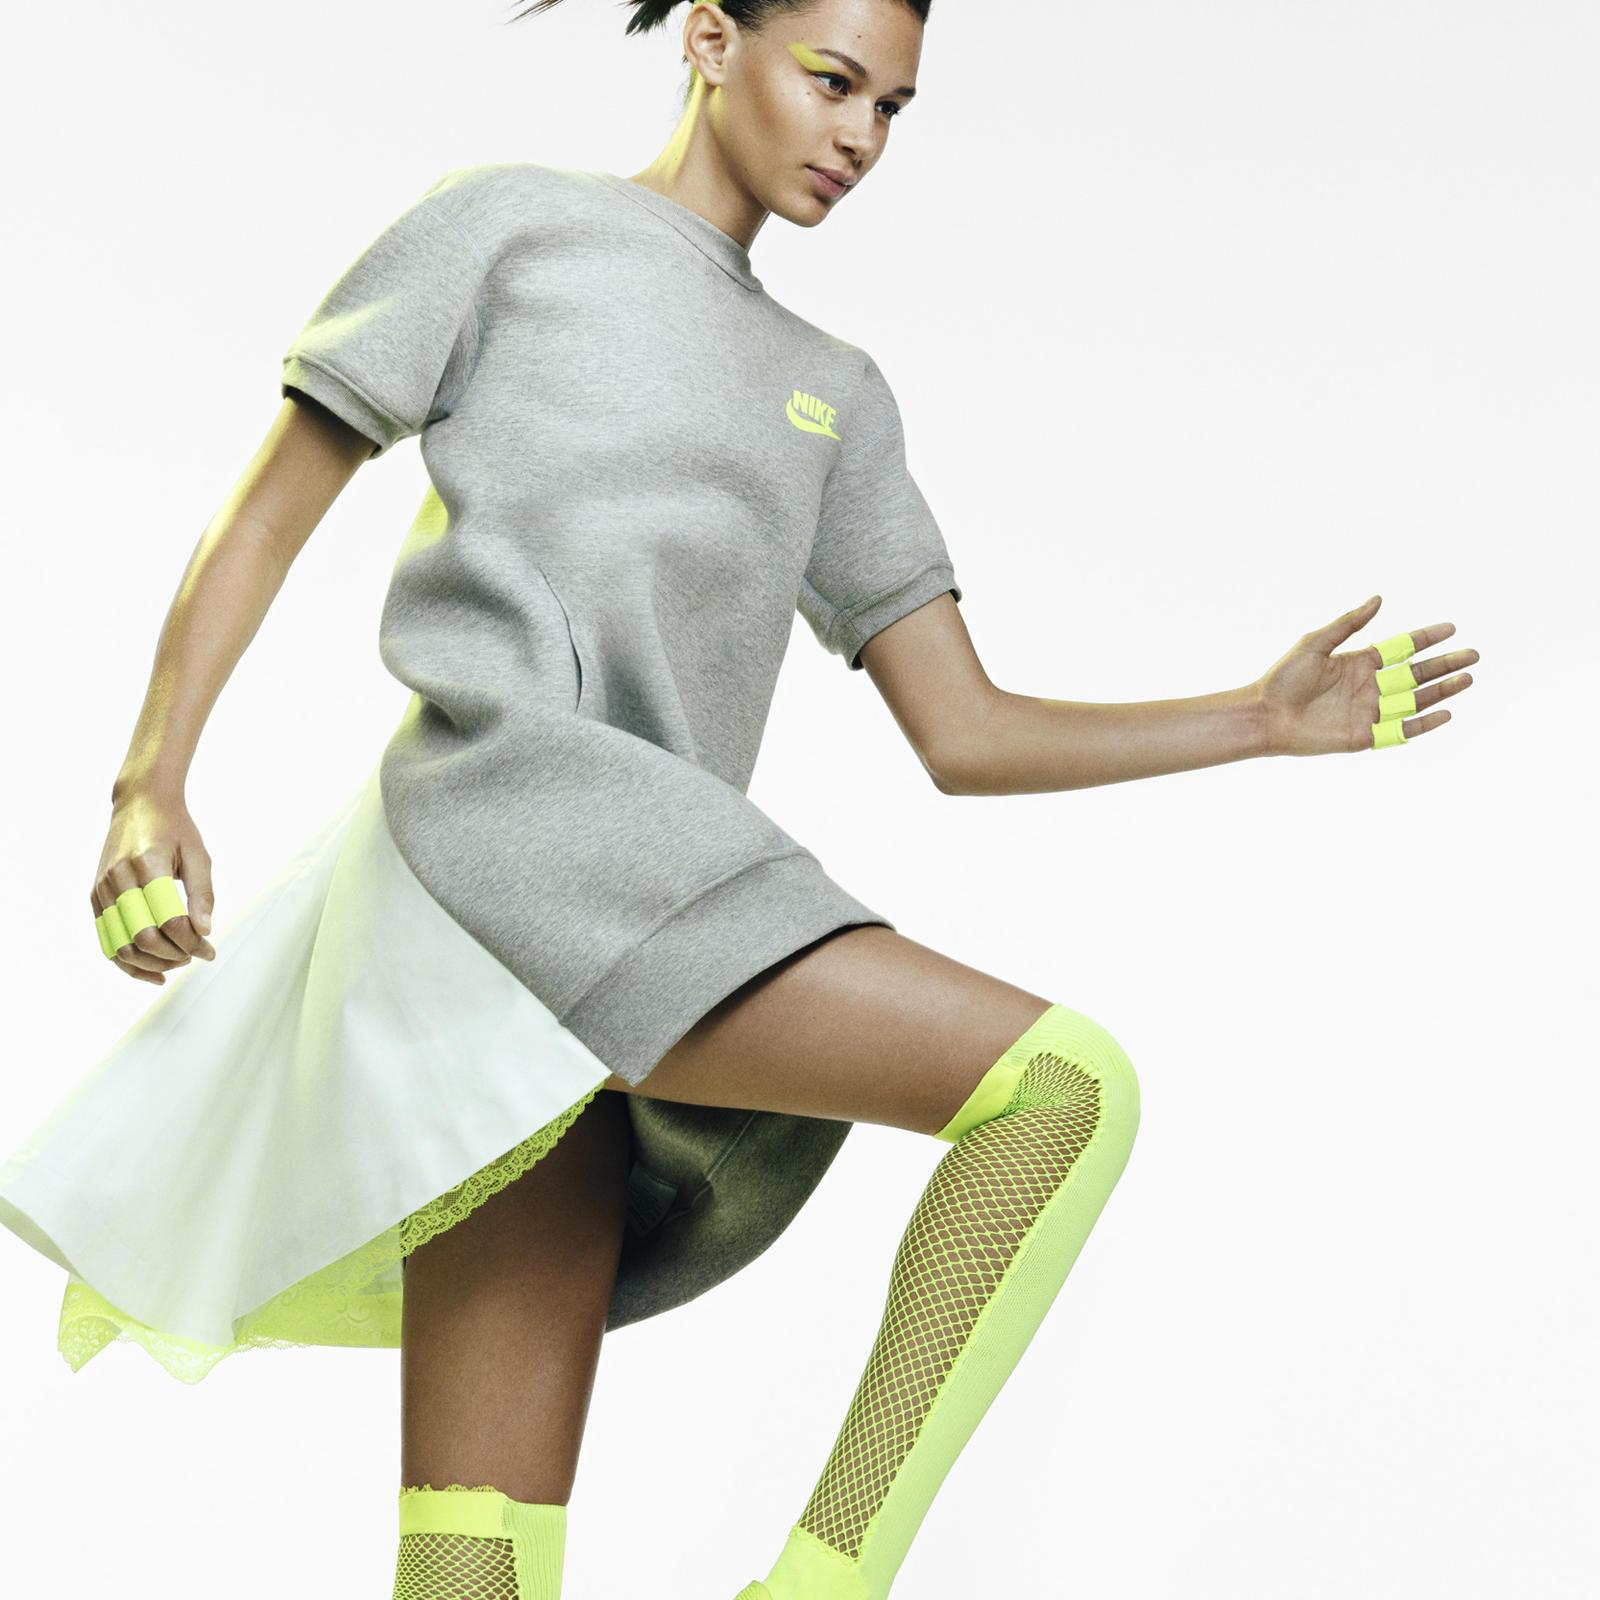 SU15_Nike Lab x sacai campaign 2